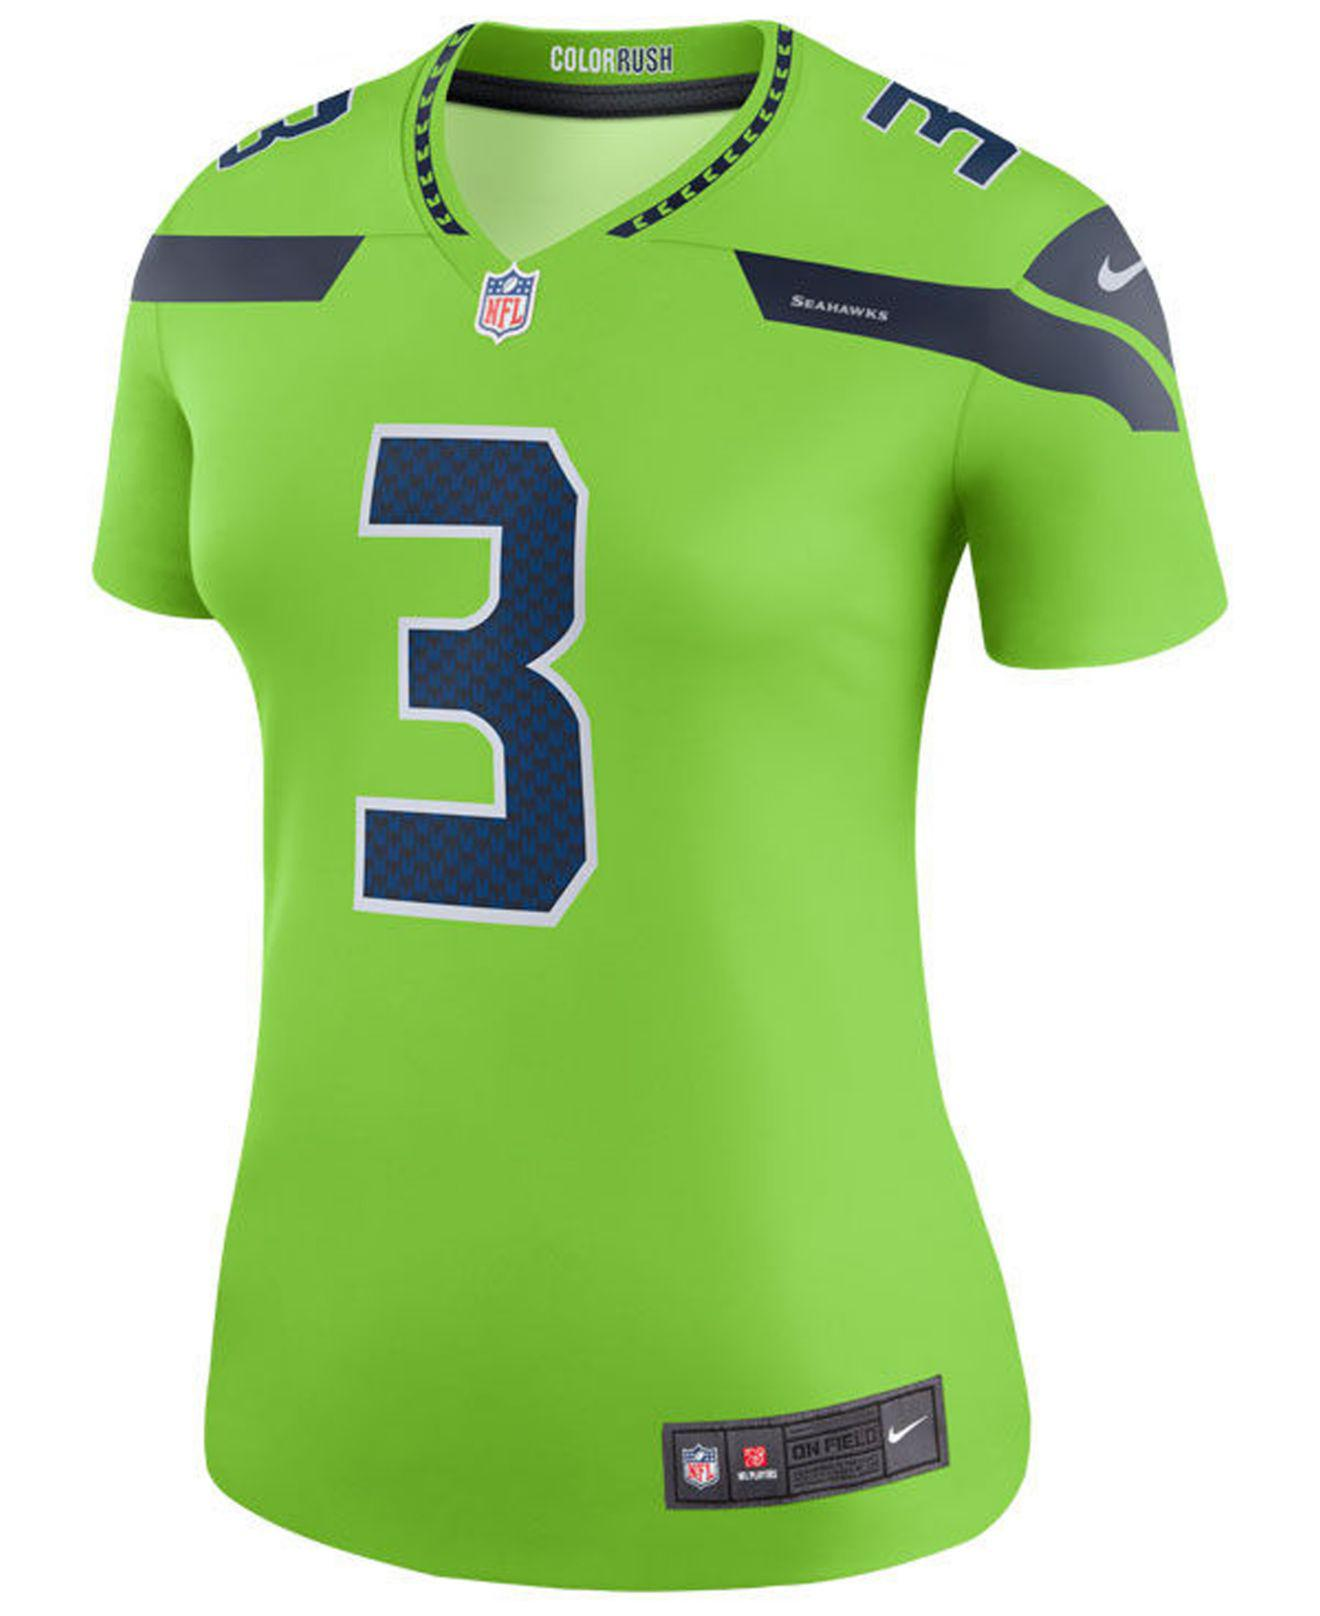 big sale 360cd 736f7 Lyst - Nike Women's Color Rush Legend Jersey in Green